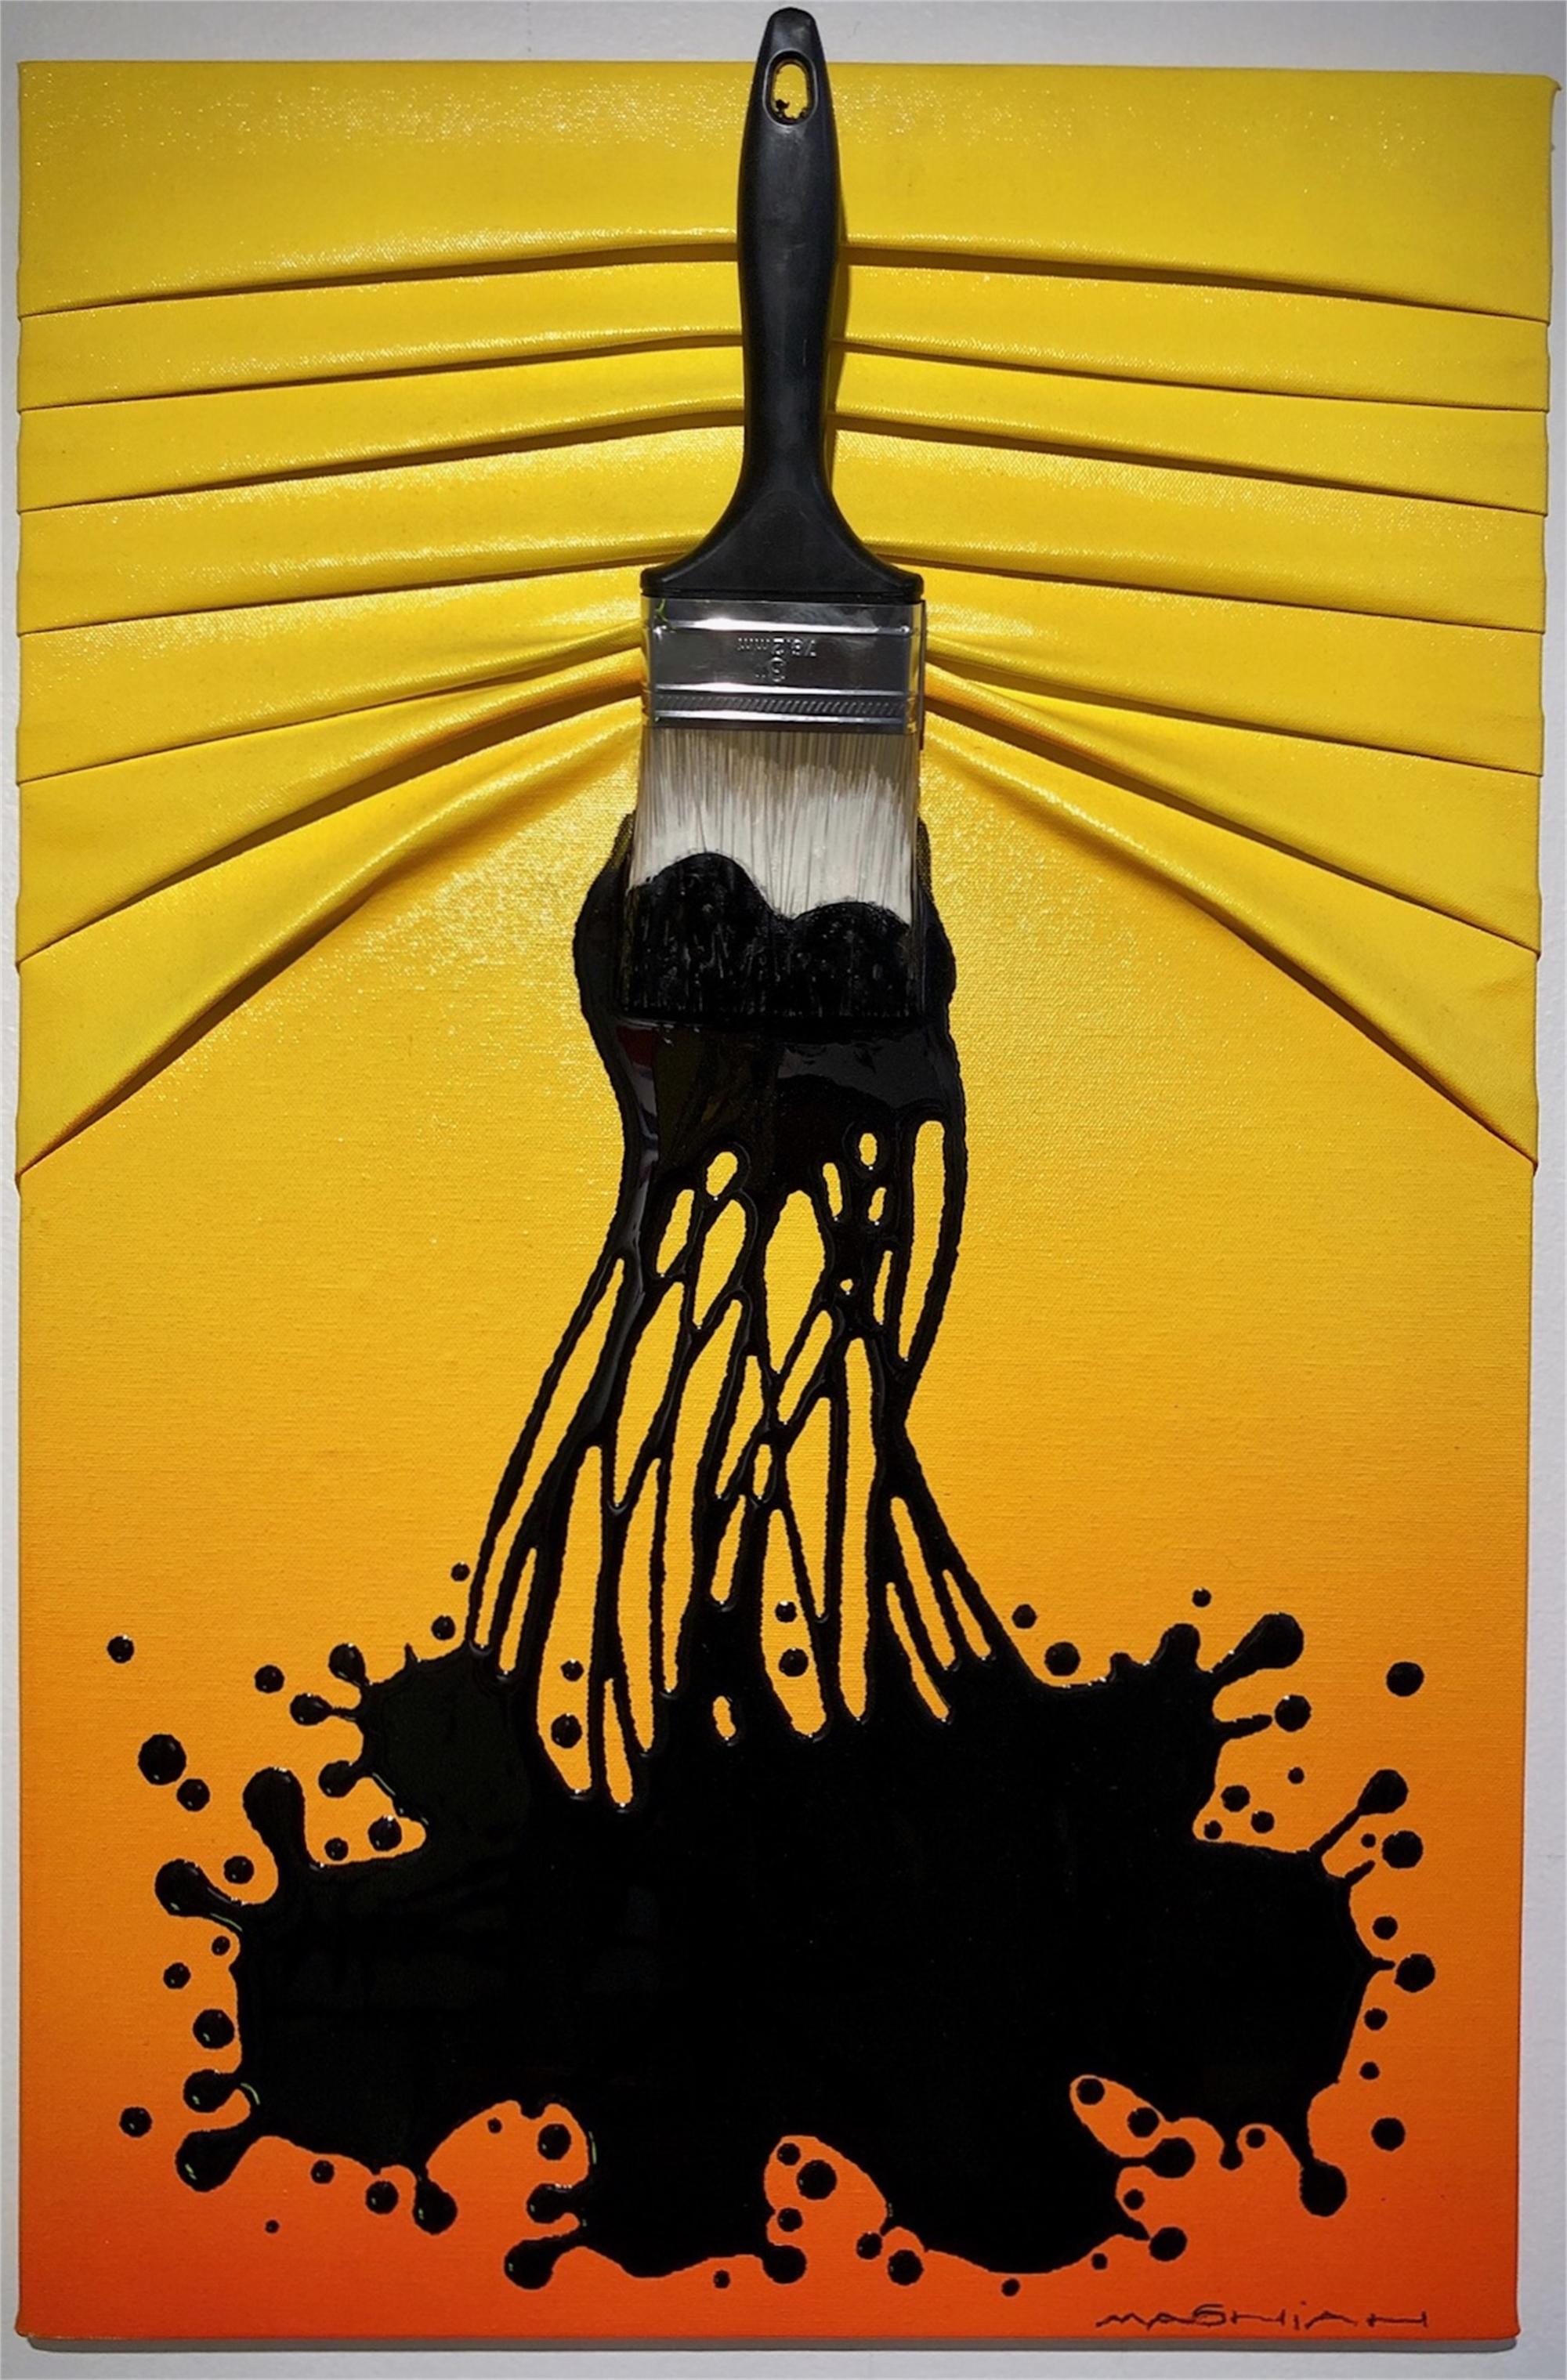 """Let's Paint"" small, Black Splash on Yellow/Orange by Efi Mashiah"